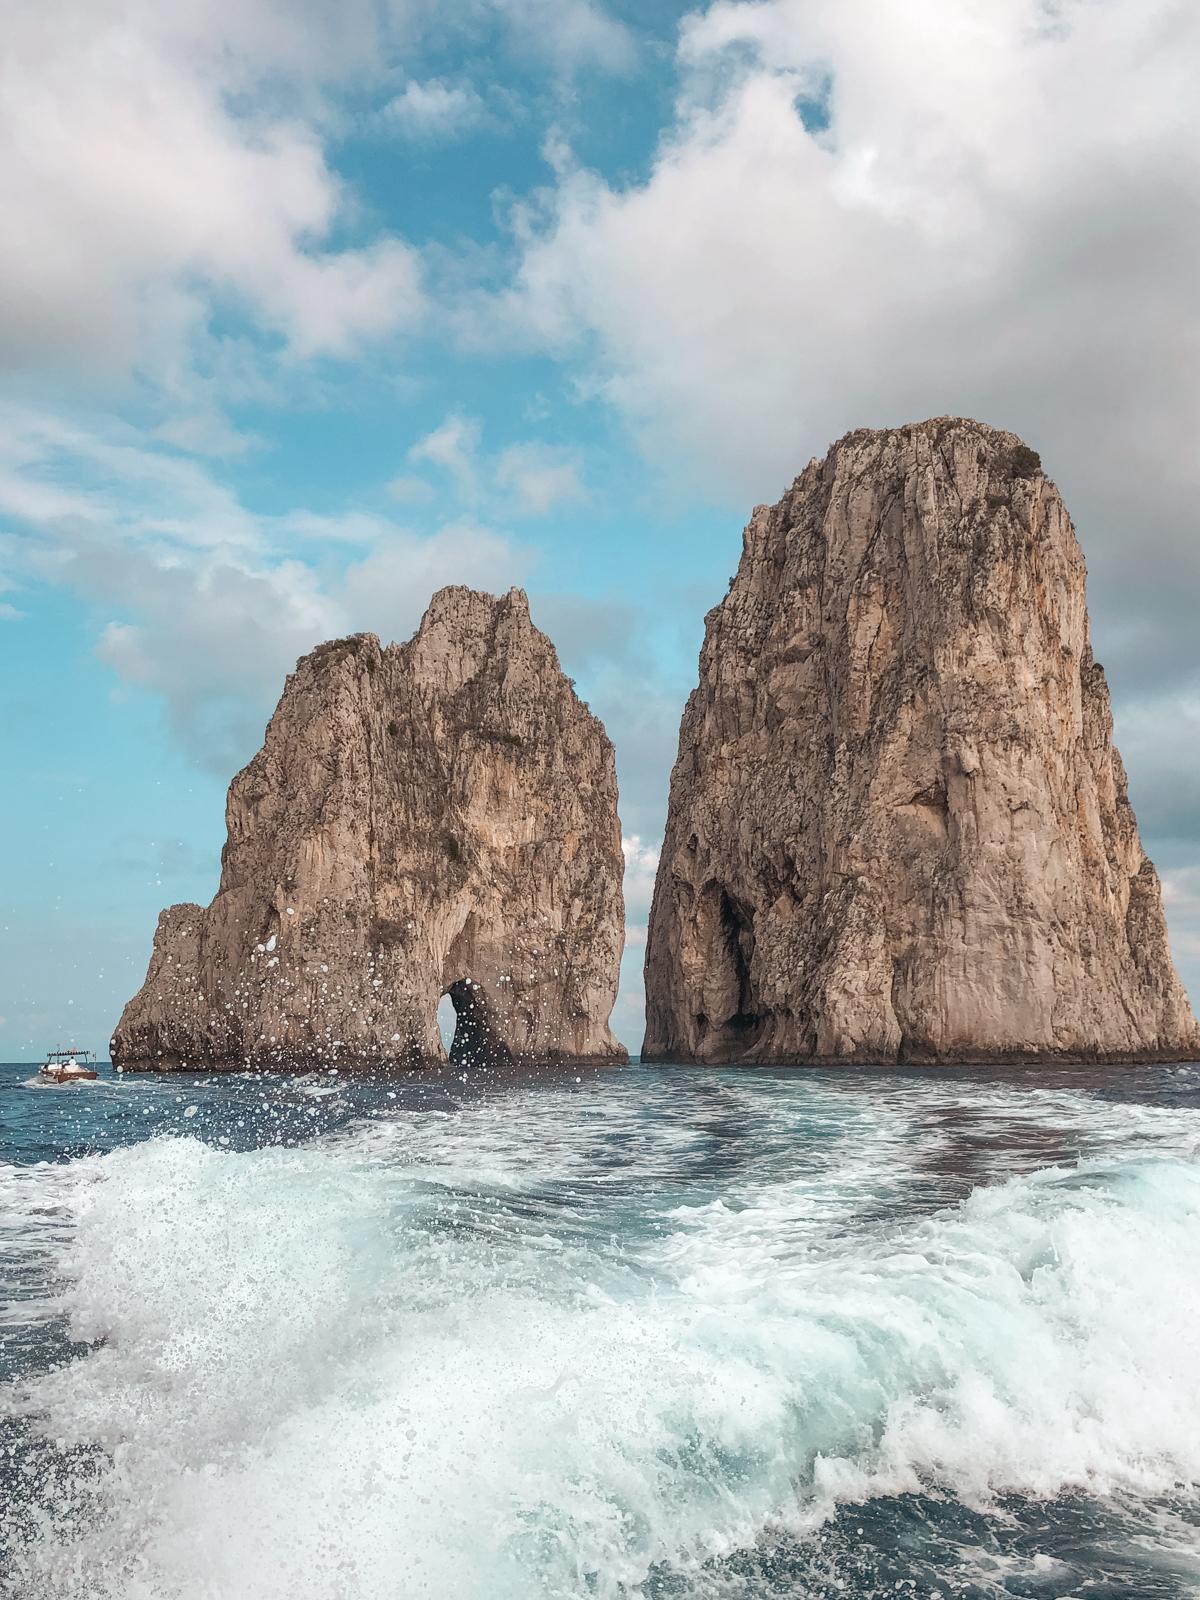 iconic faraglioni rocks